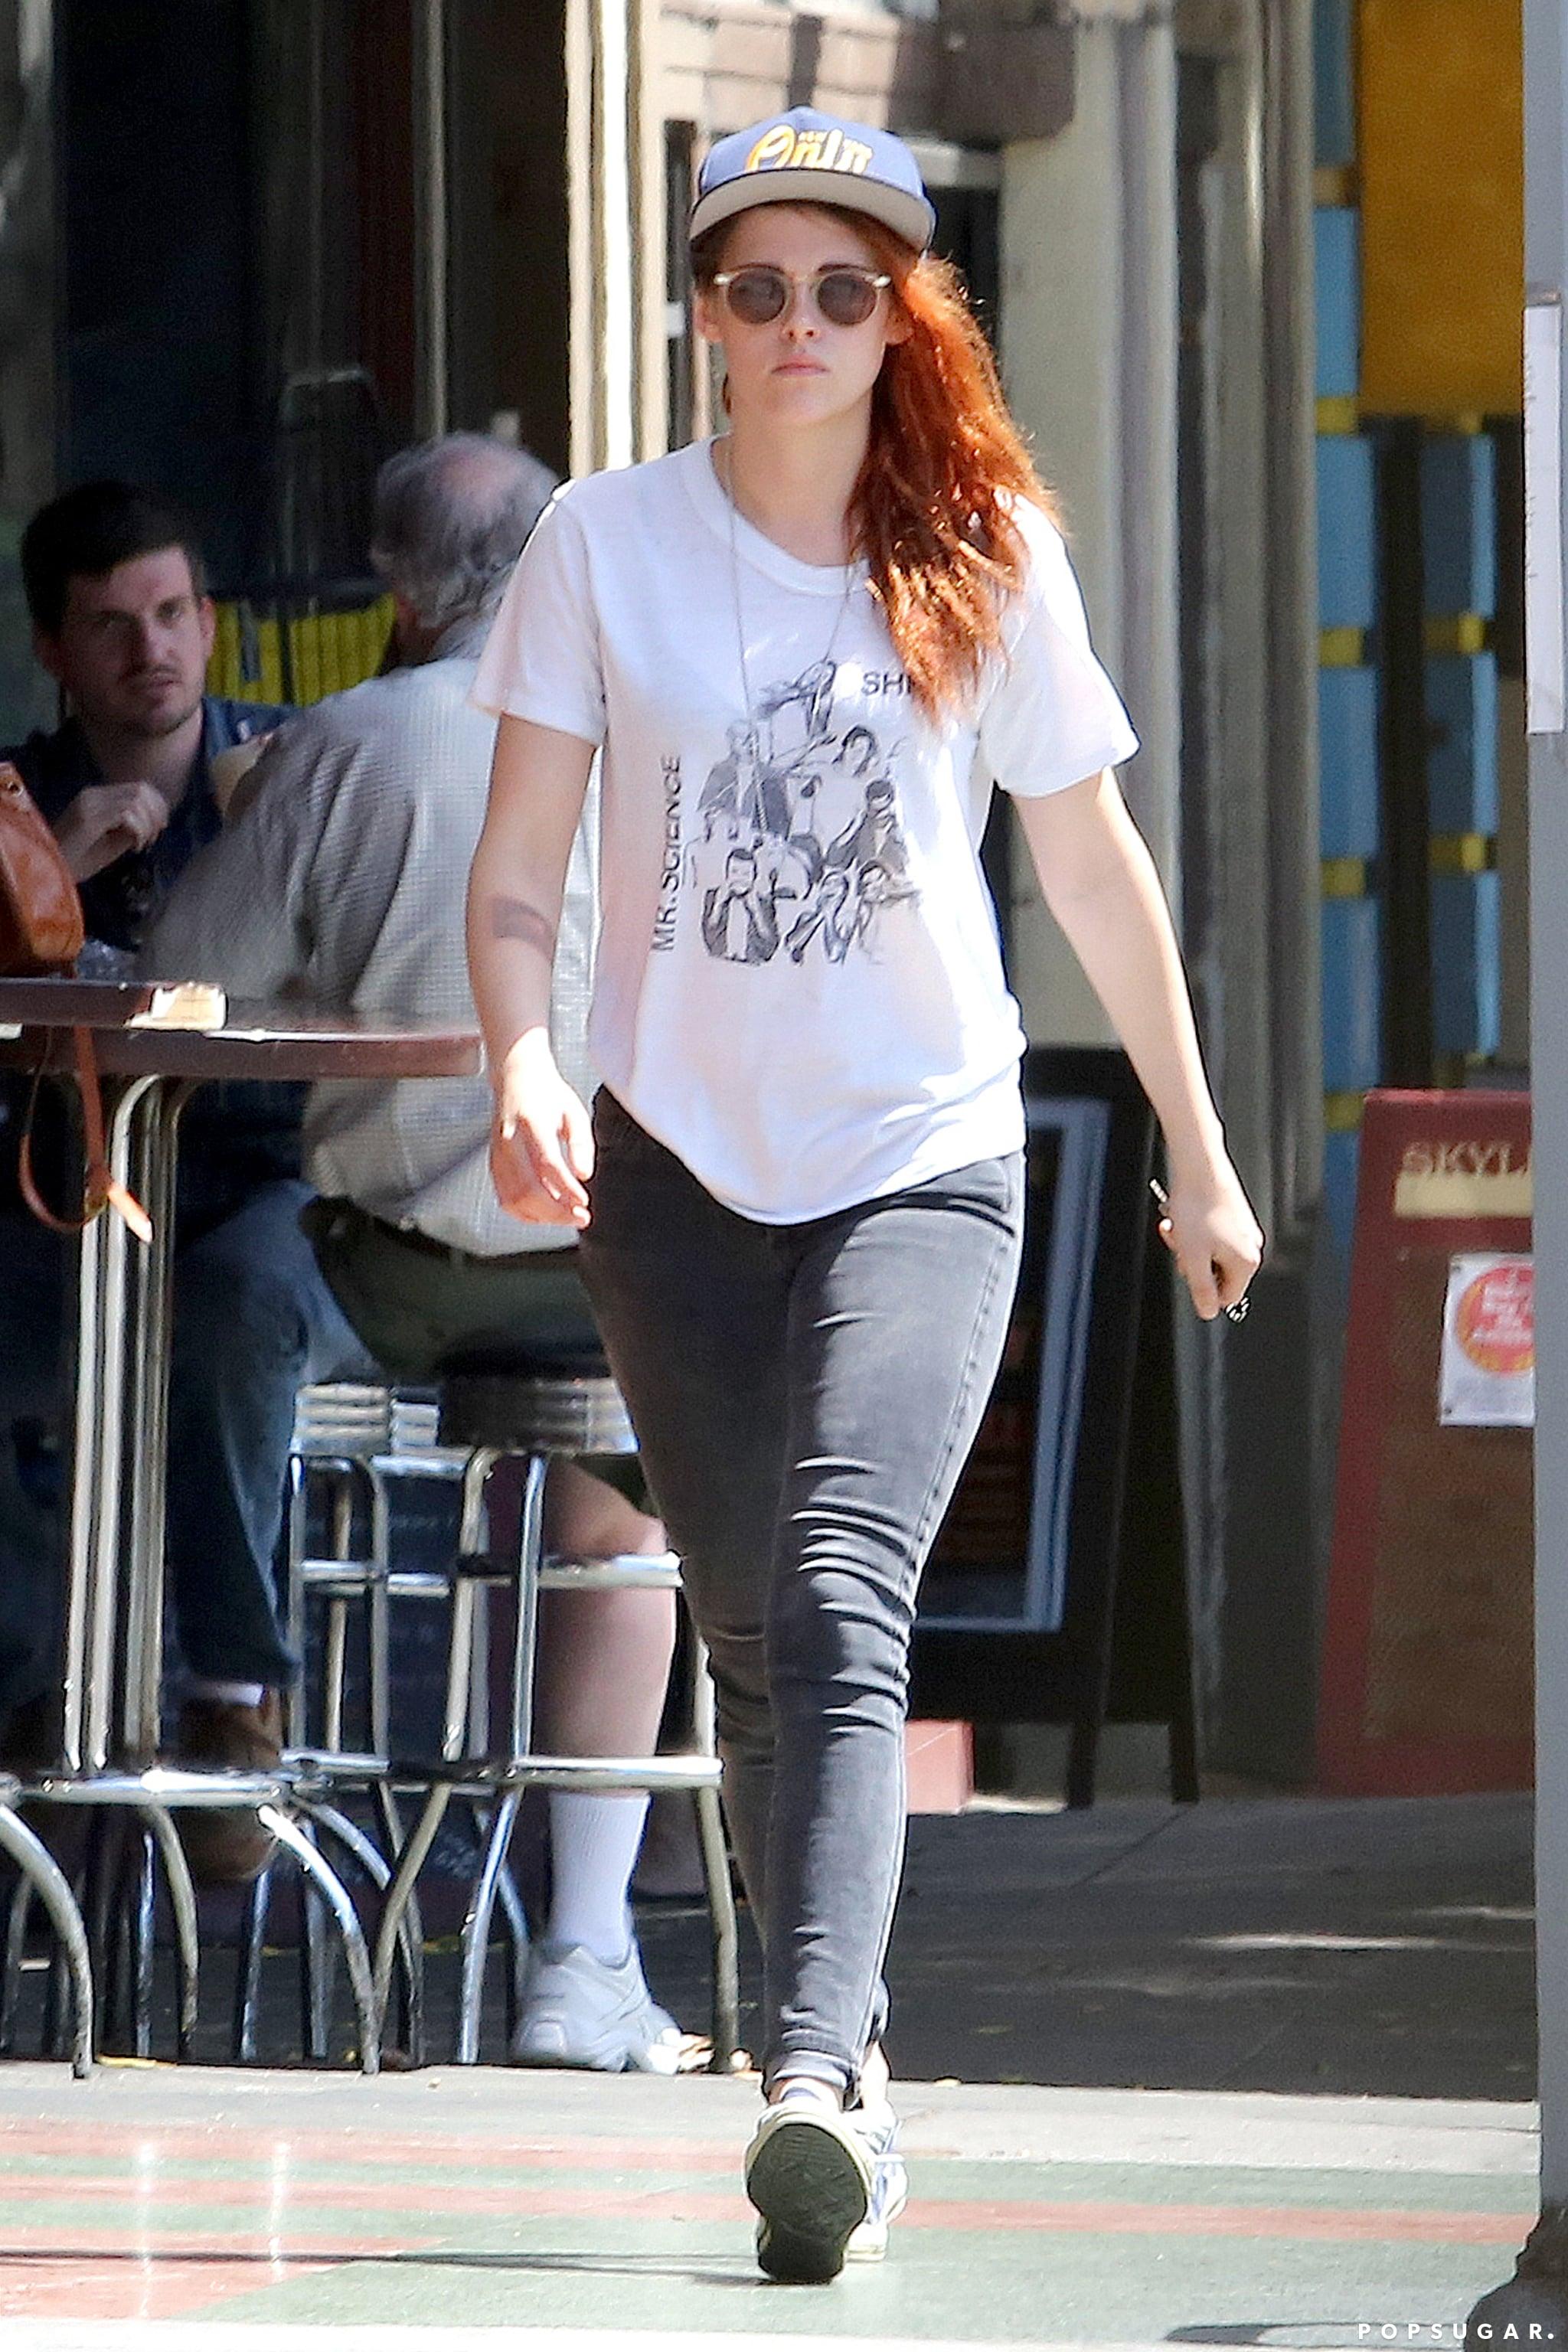 Kristen Stewart Is Back to Her Old Routine in LA